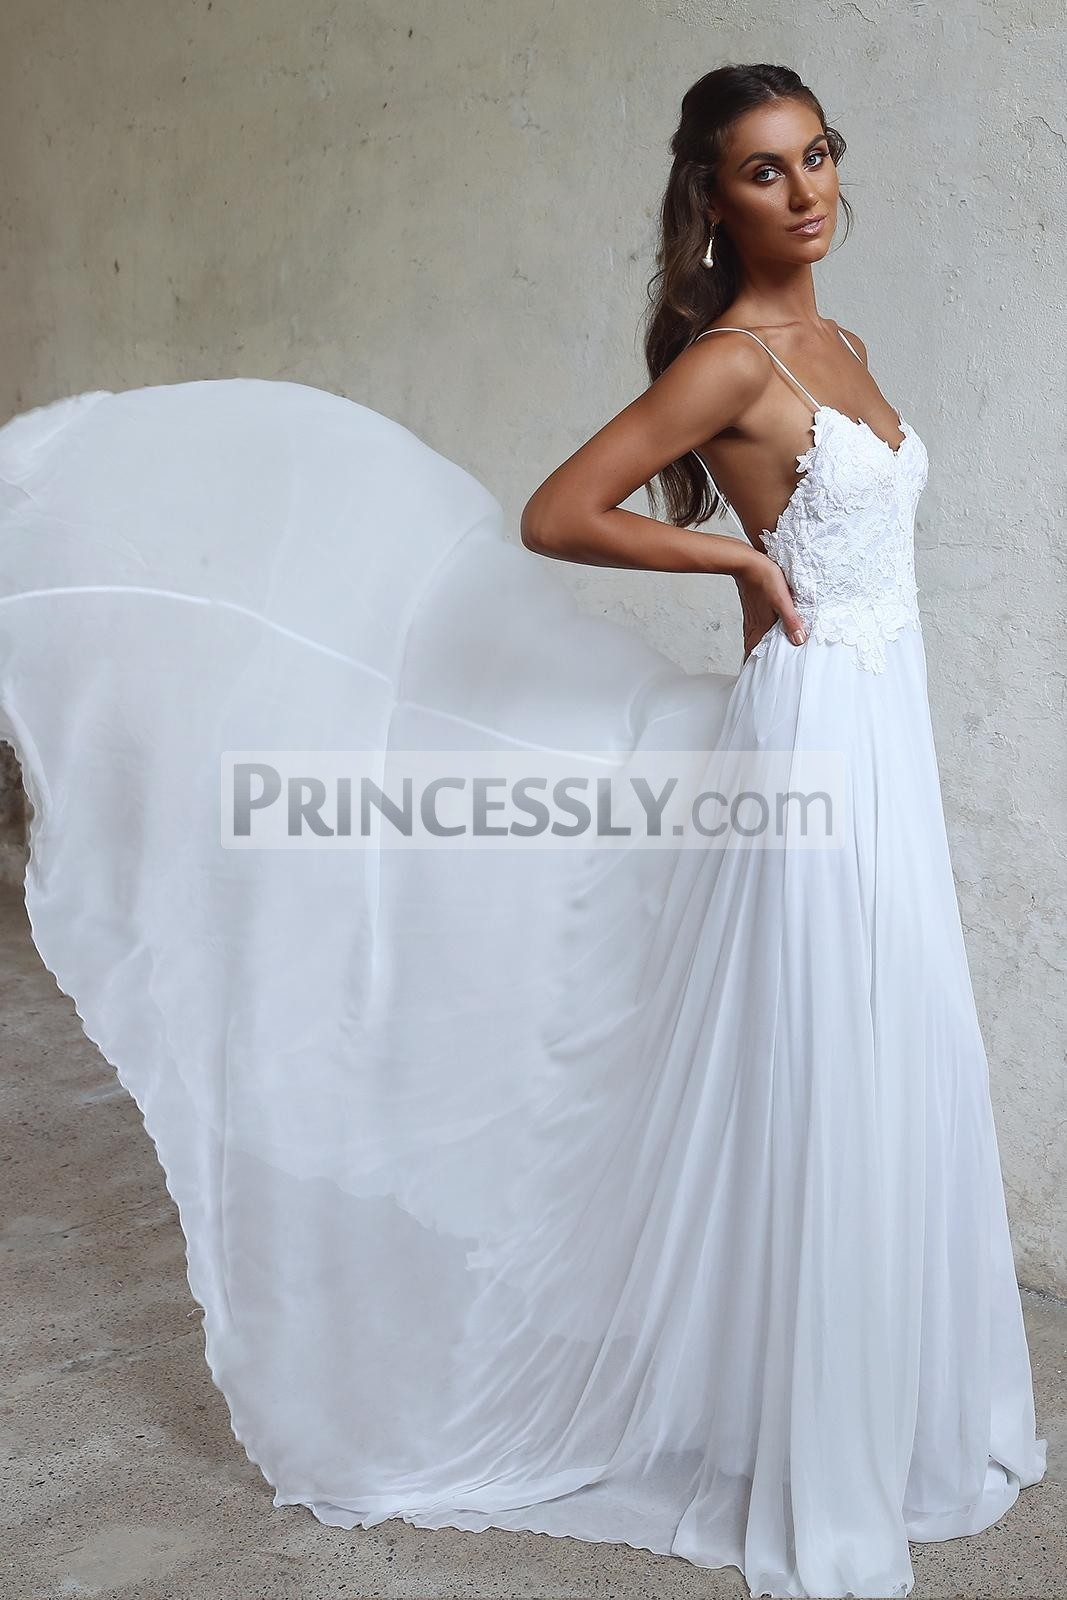 Princessly.com-K1004121-Ivory Lace Chiffon Spaghetti Straps Wedding Party Dress-31